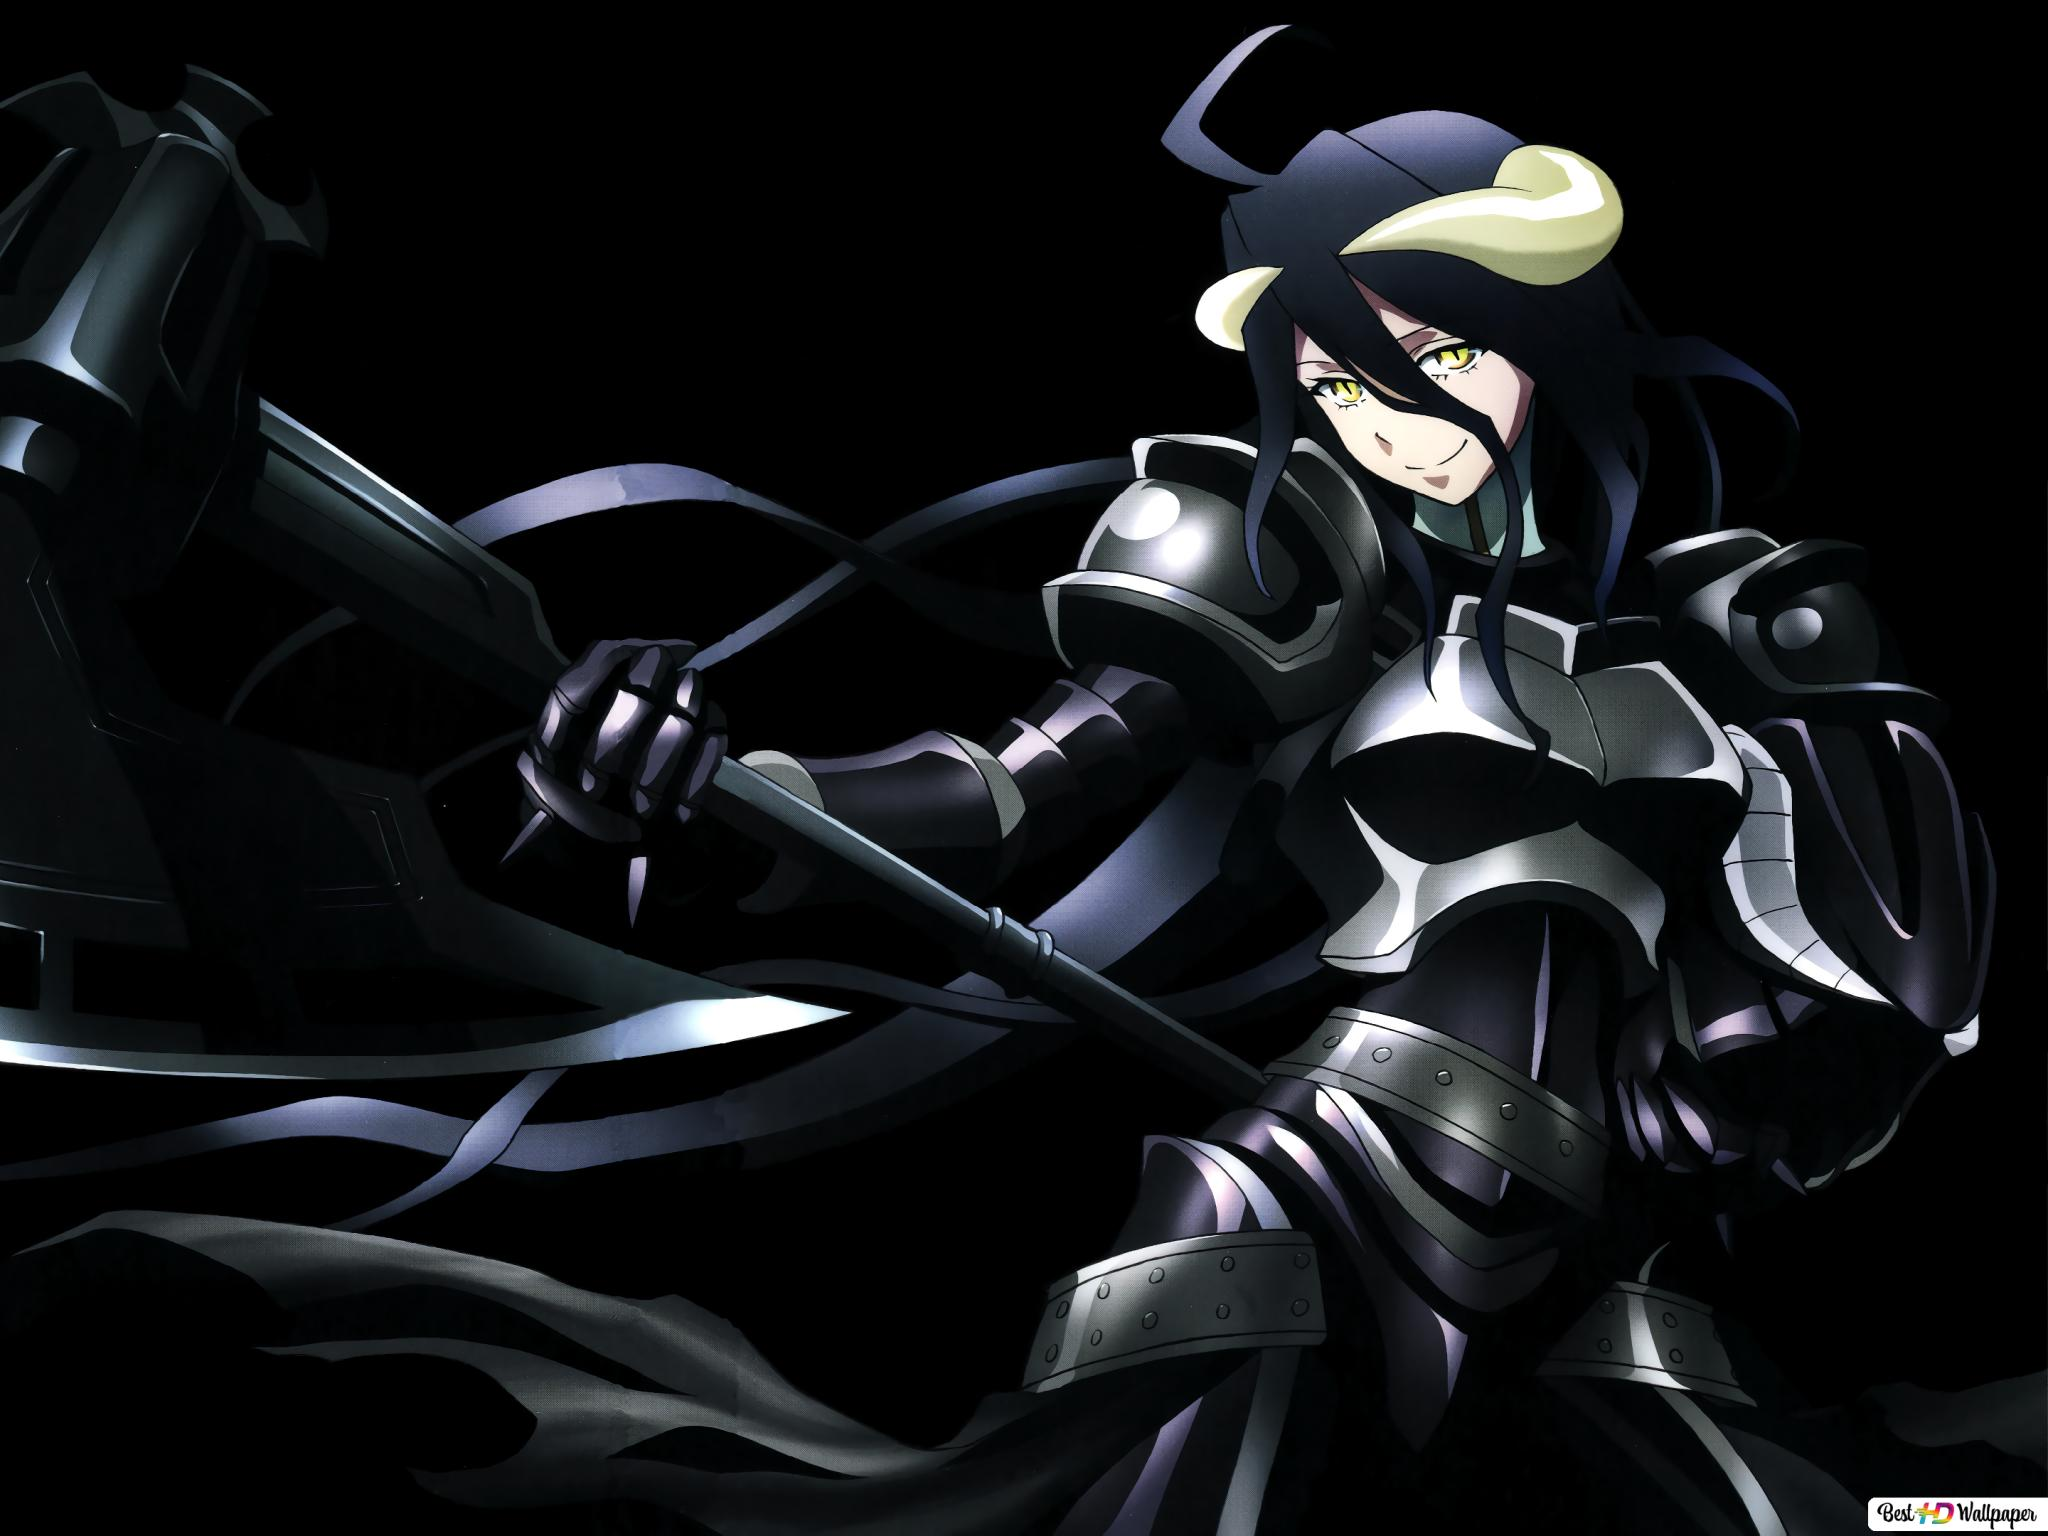 Overlord Albedo Dark Hd Wallpaper Download